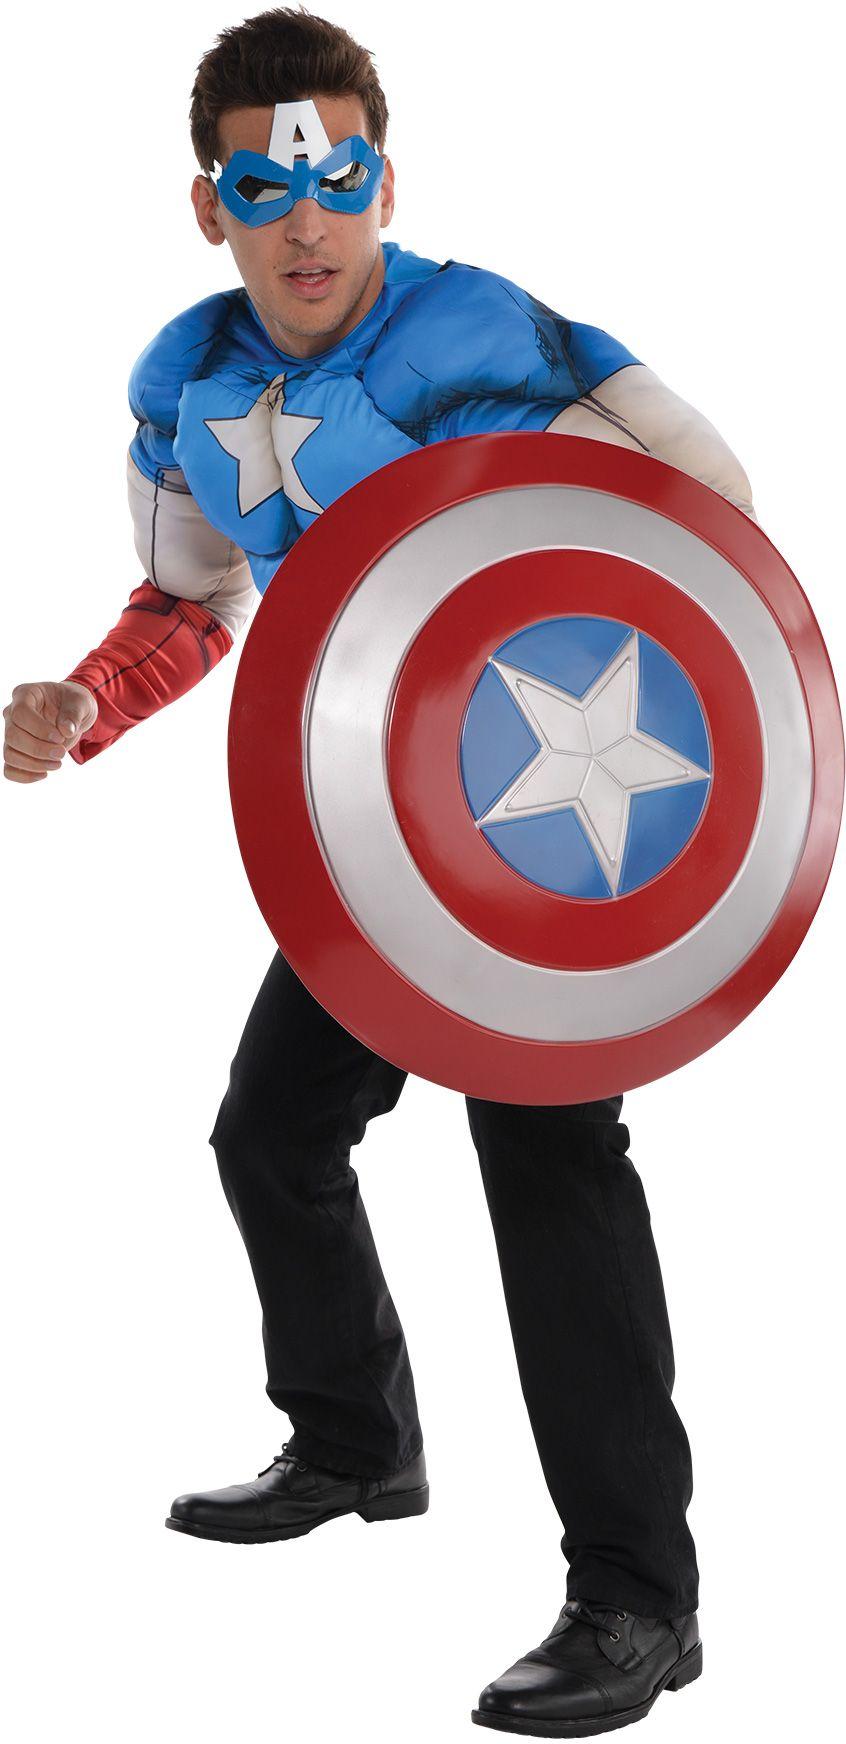 Create Your Own Look - Men's Captain America #1